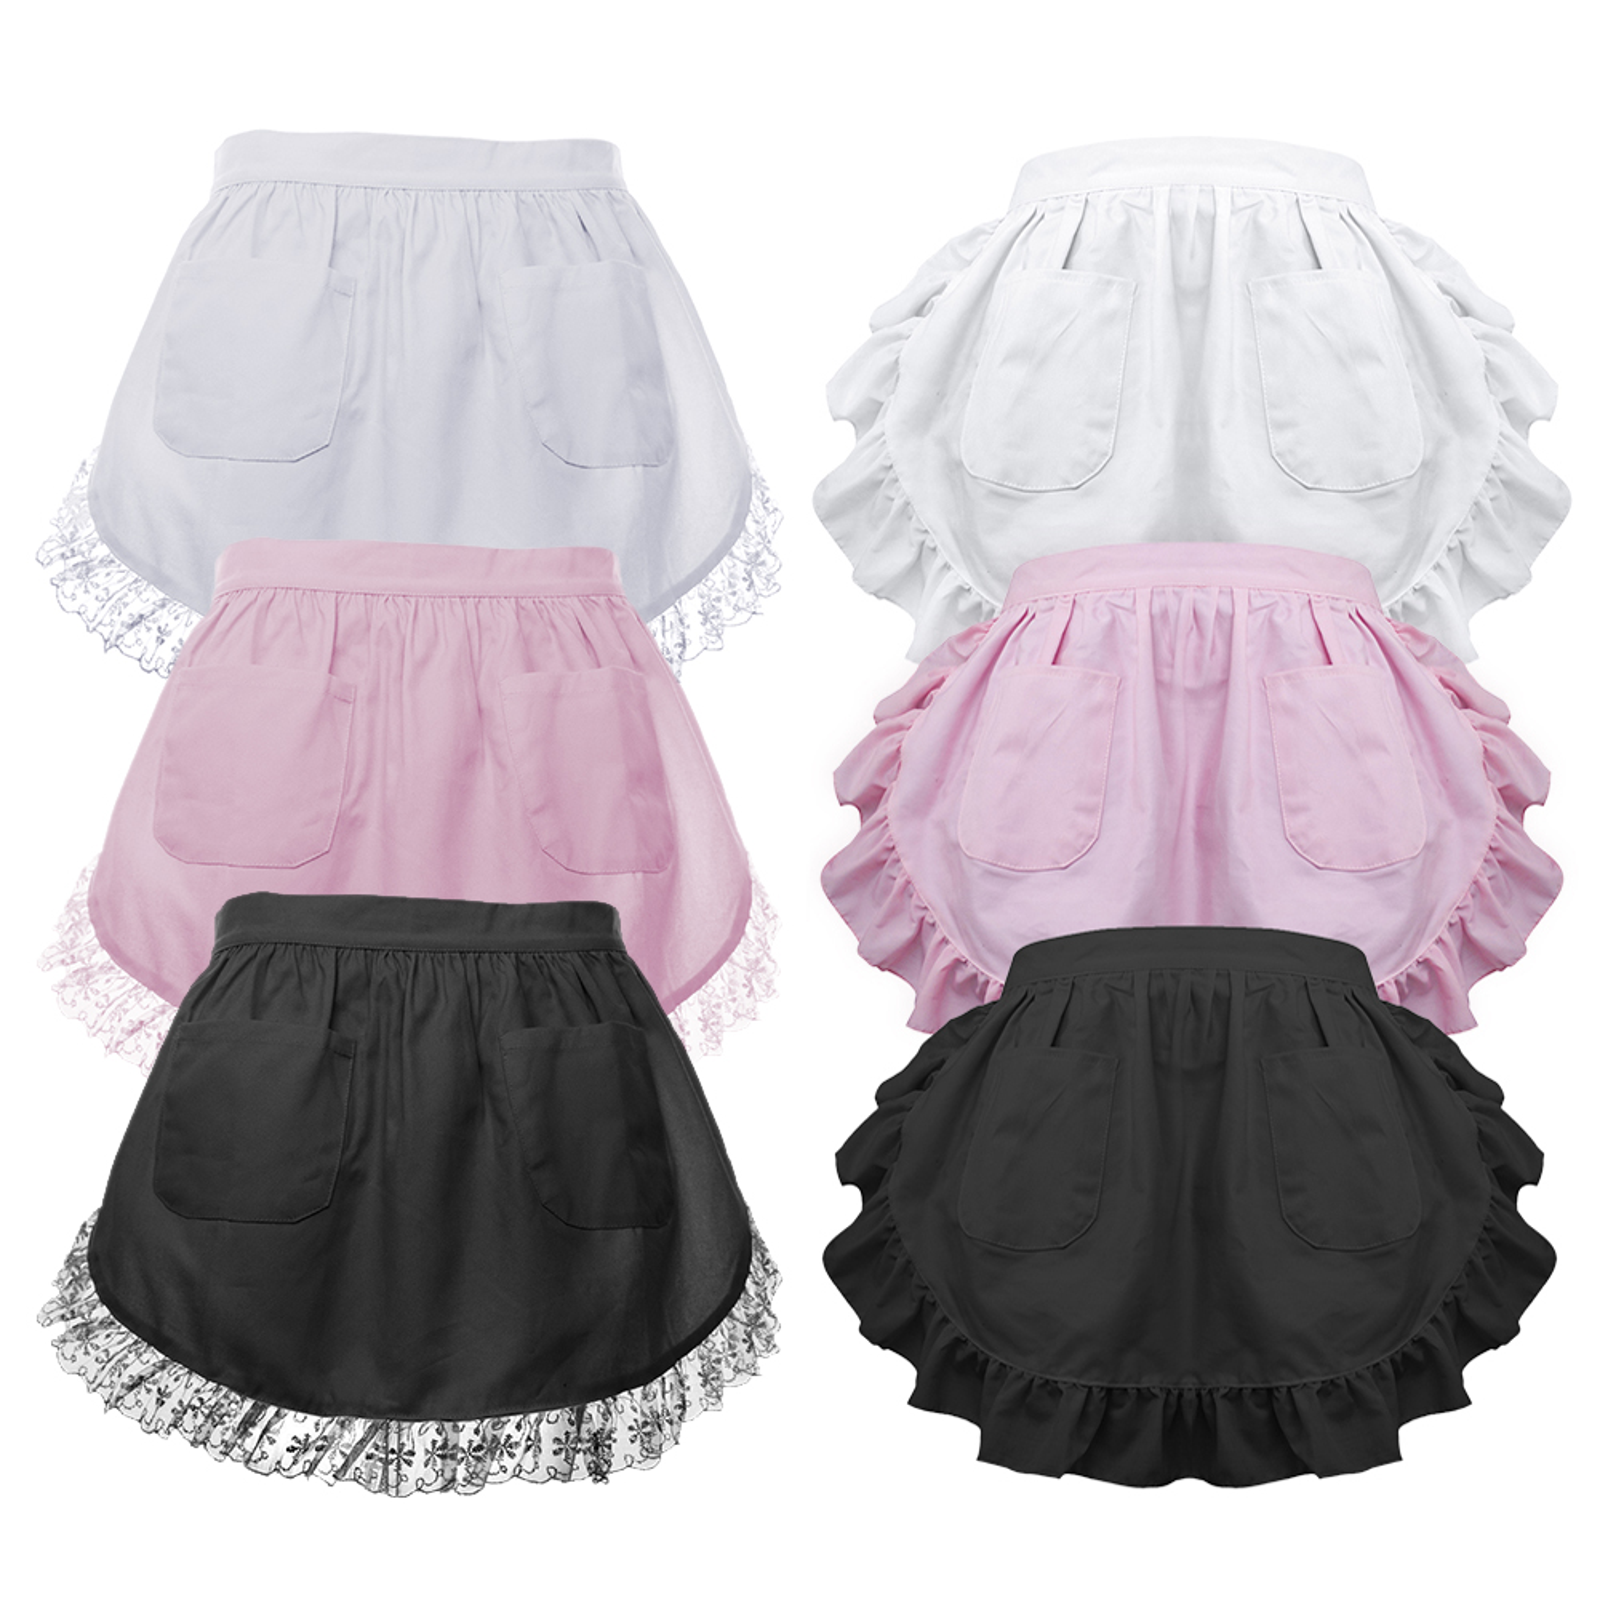 White half apron - Aspire Women S Waist Apron Victorian Maid Costume Lace White Cotton Half Apron Kitchen Party Favors Two Pockets